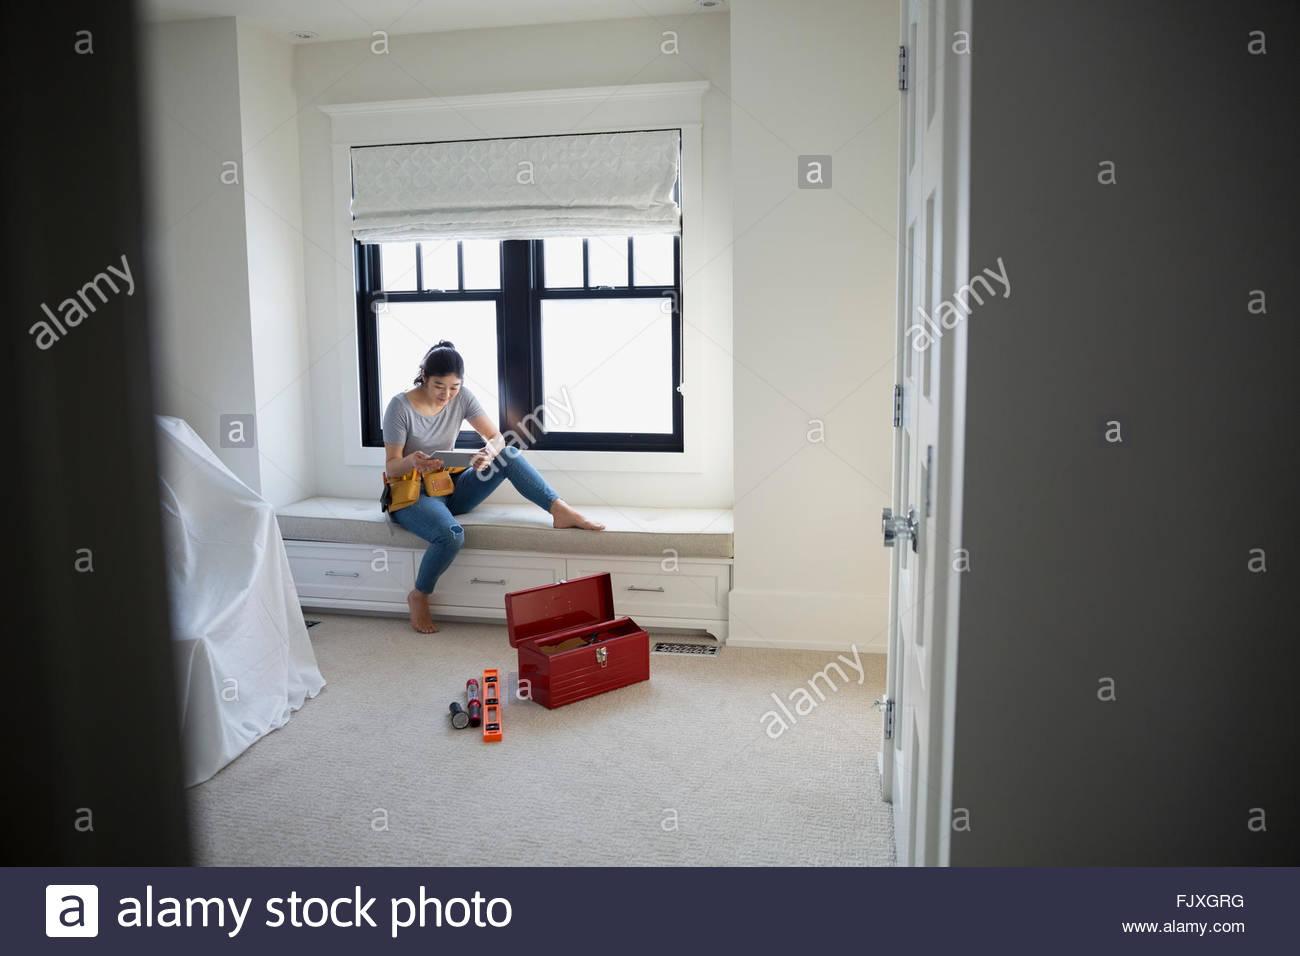 Woman researching DIY on digital tablet in bedroom - Stock Image